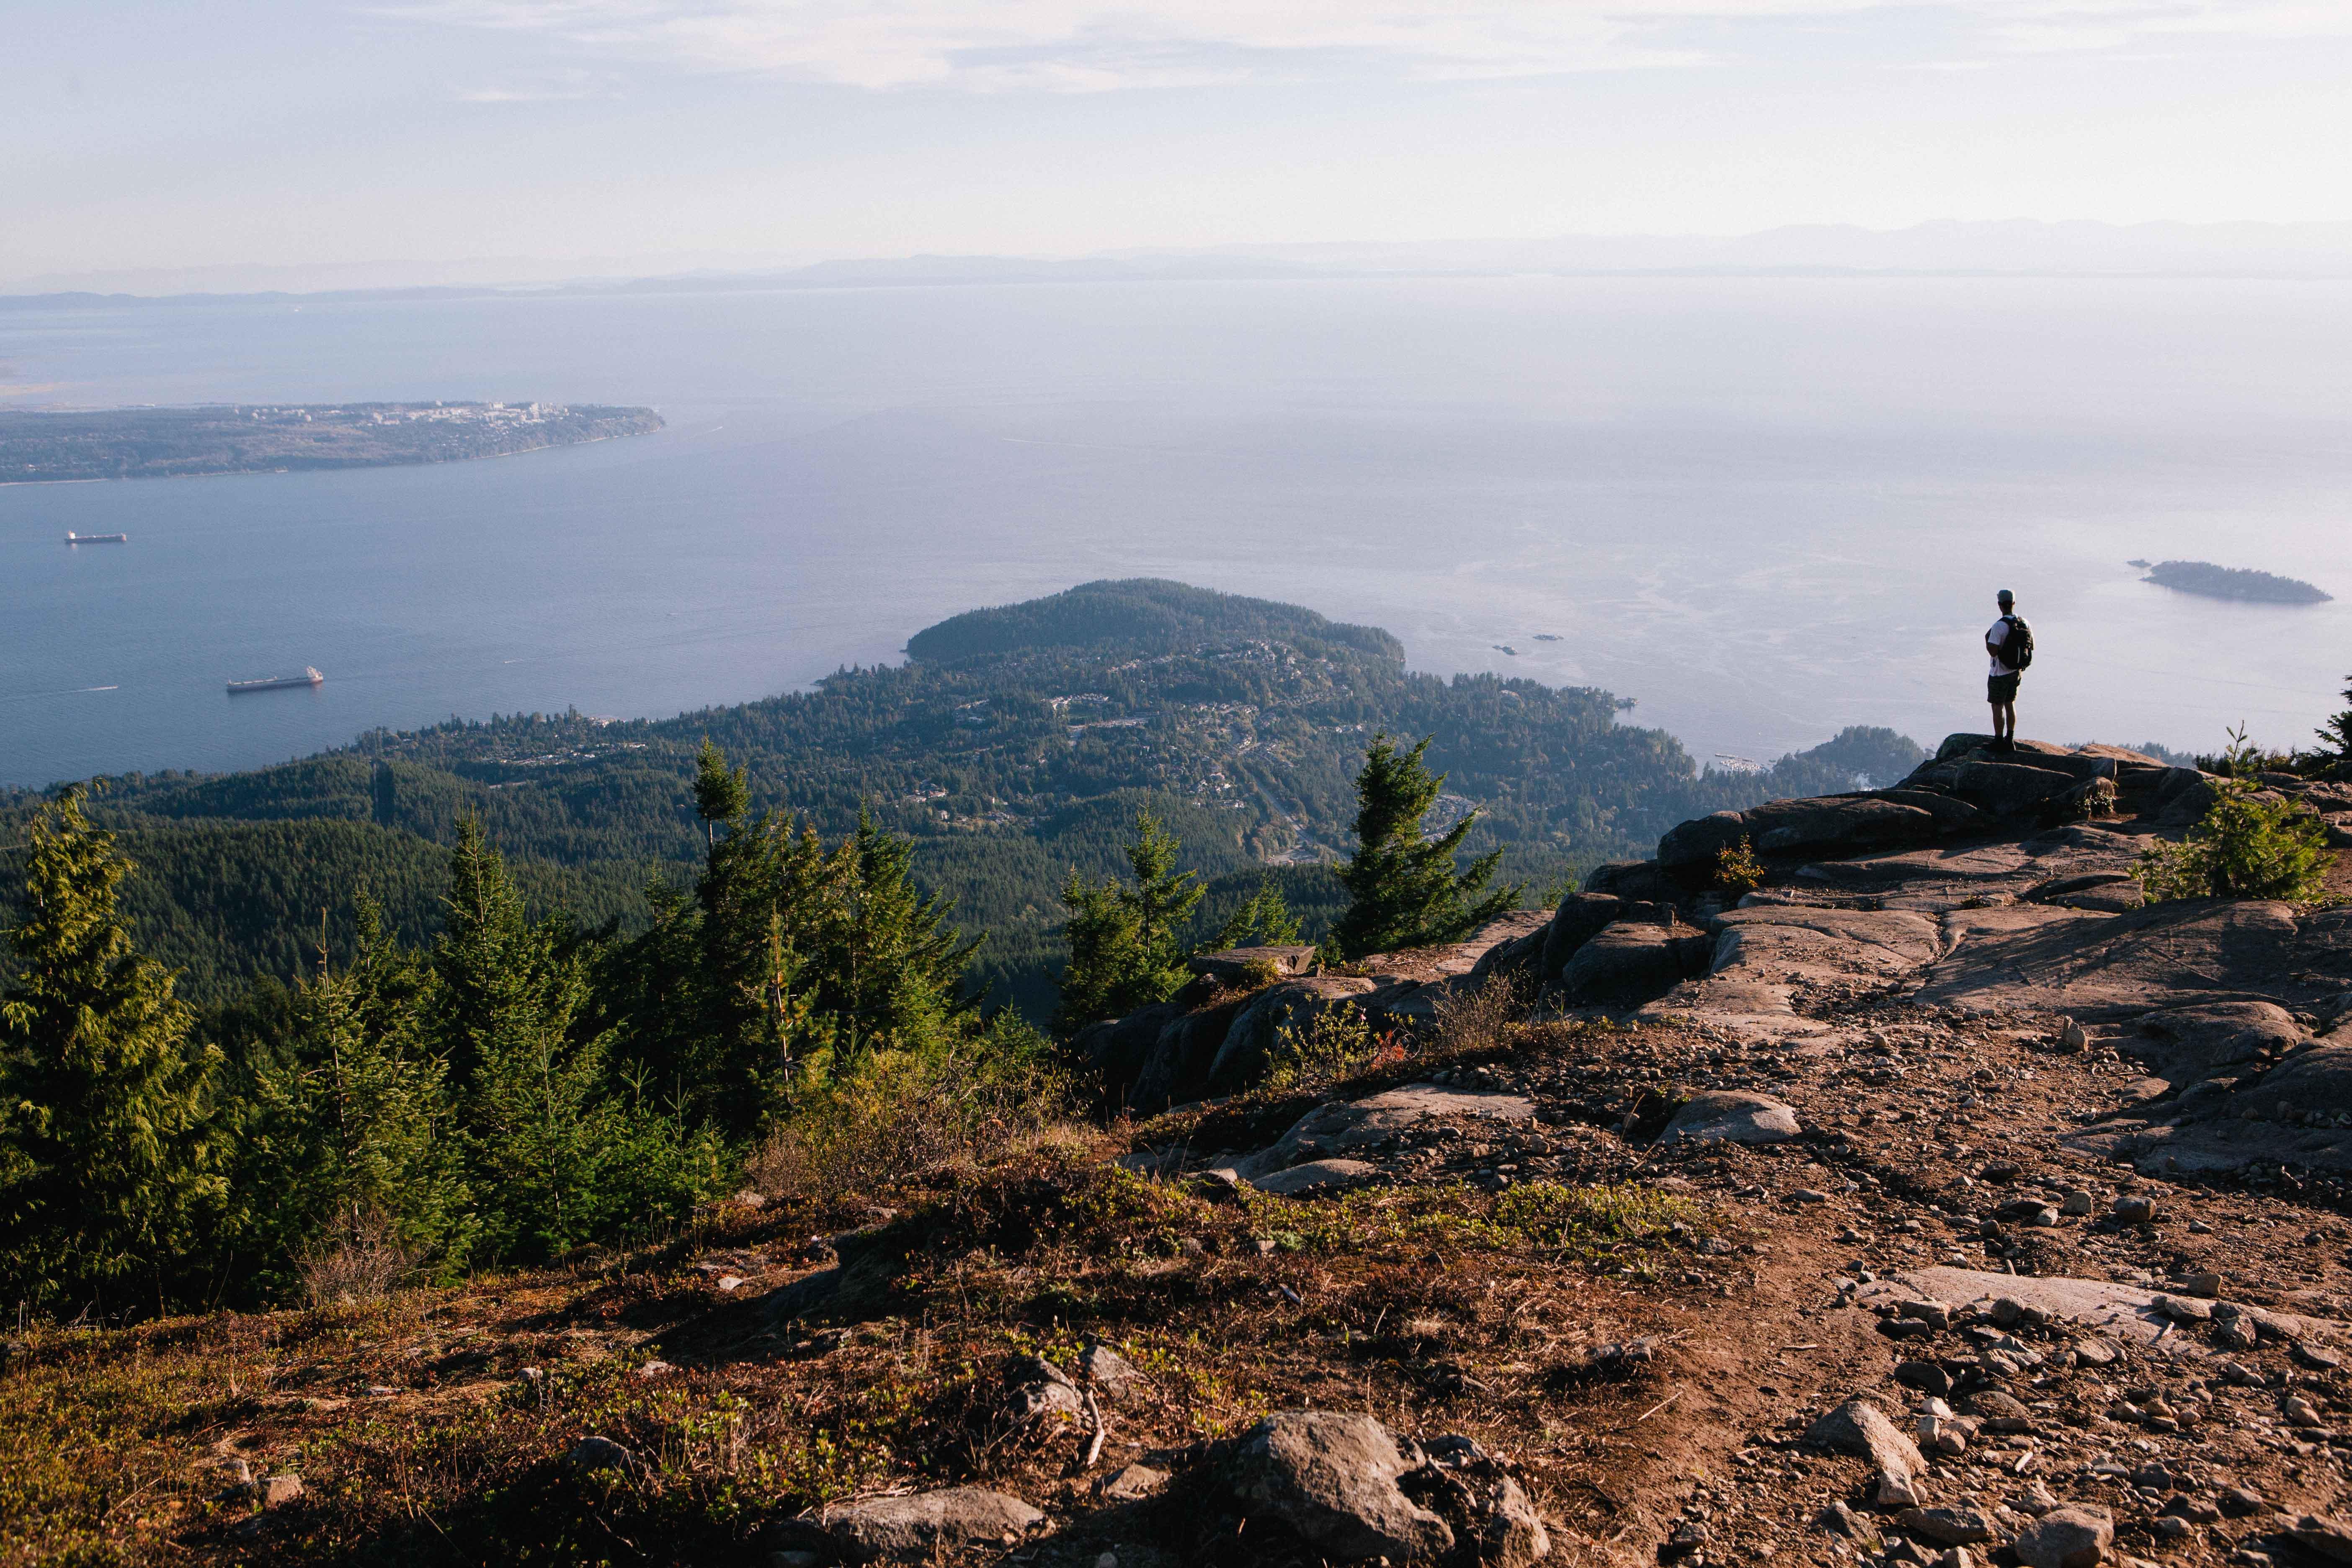 eagle bluffs hike cypress mountain vancouver hiking. Black Bedroom Furniture Sets. Home Design Ideas